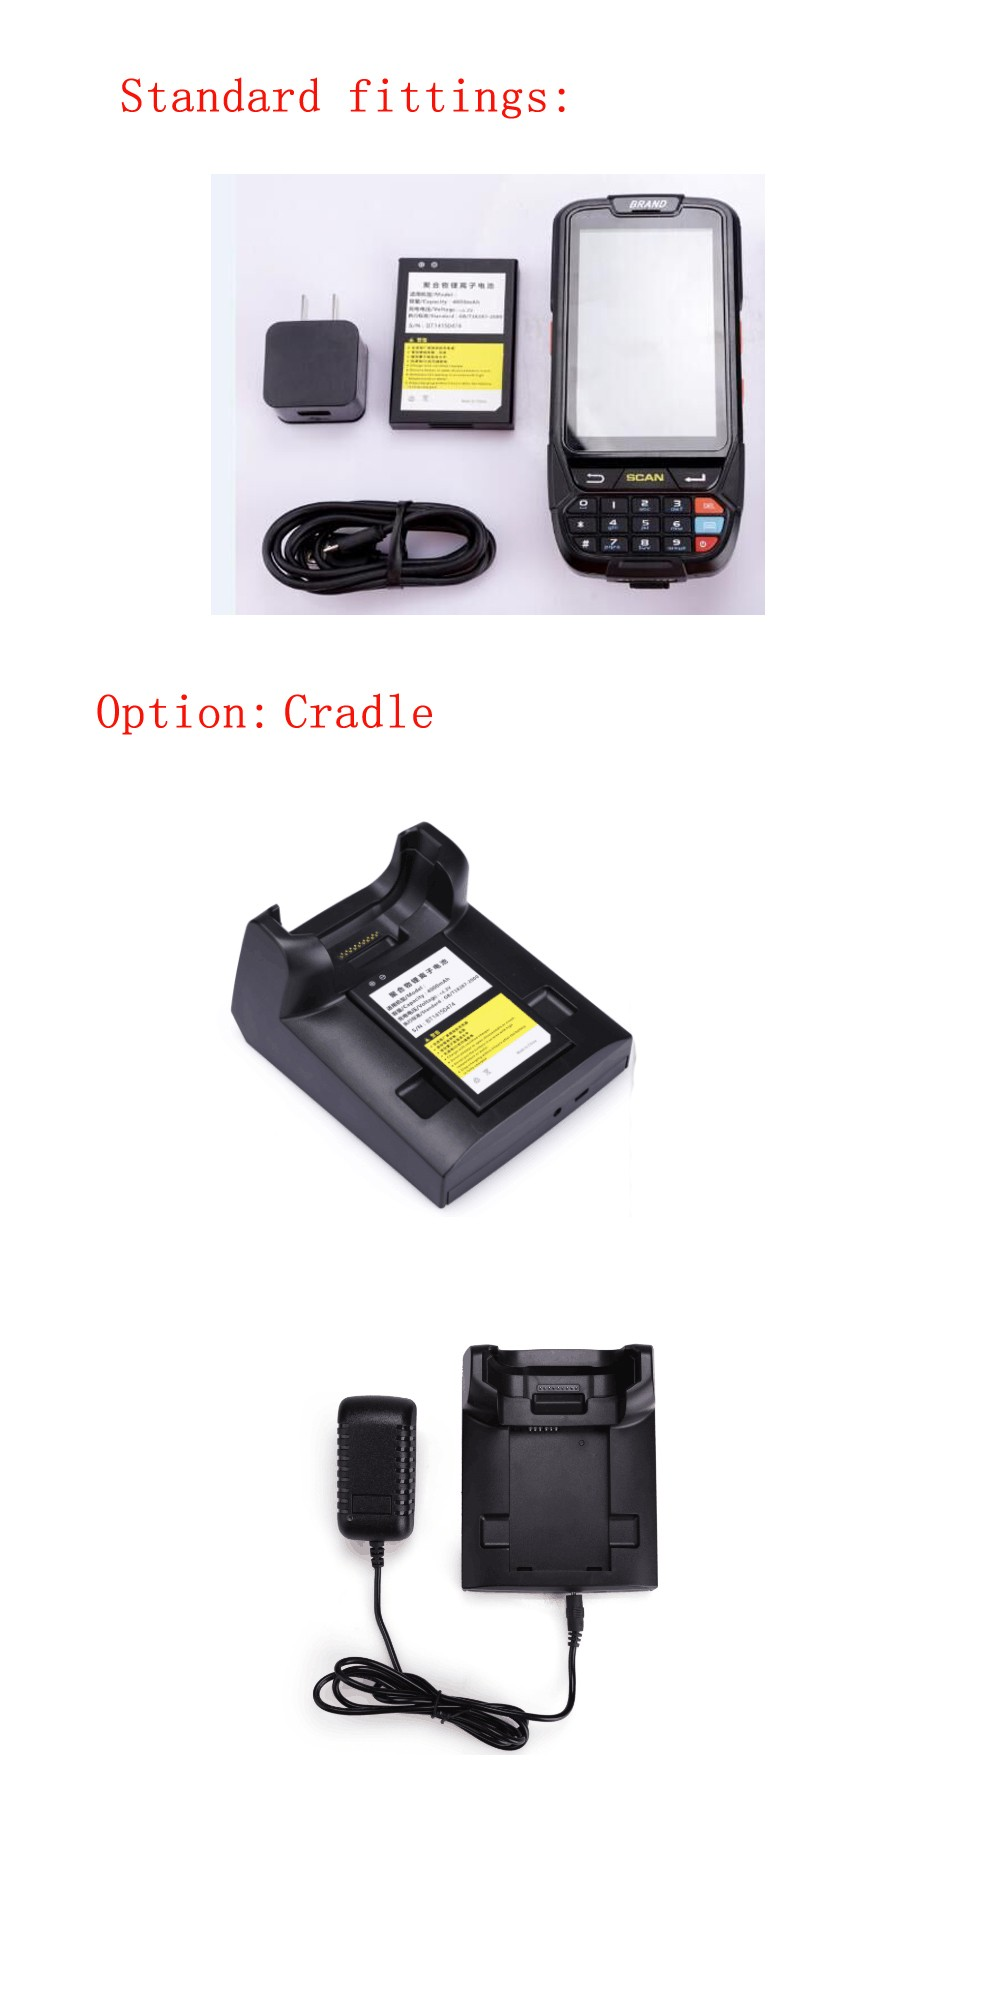 f92b4bdd4f1dbb 2nd Shine Tech Barcode Scanner S802 PDA Cradle Scanners Cheap ...